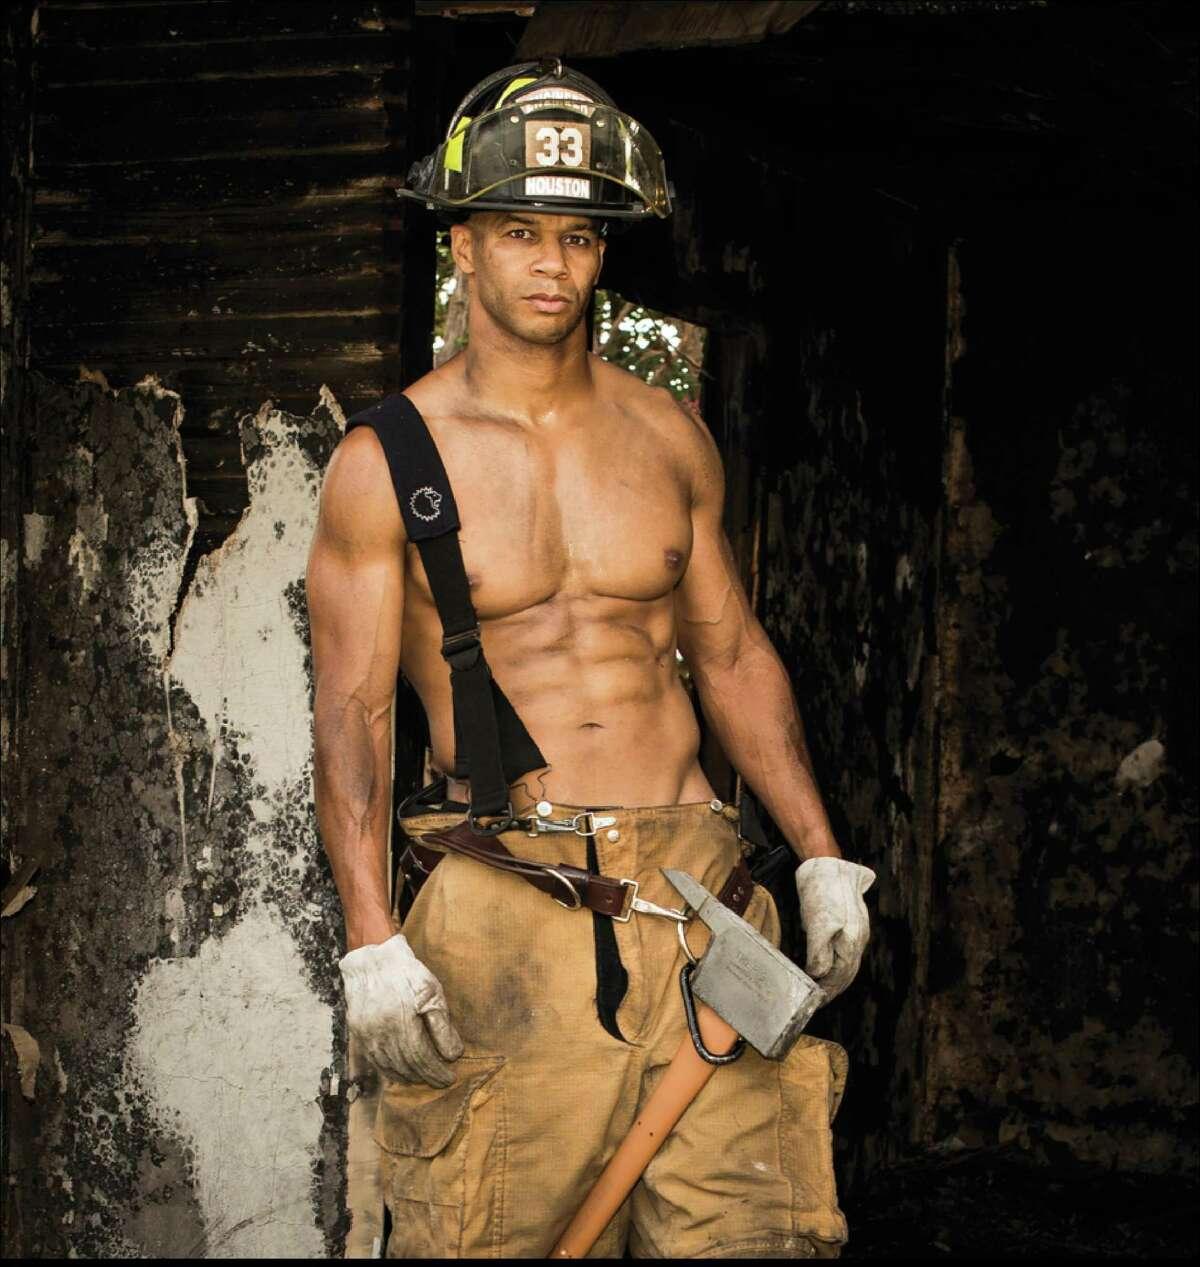 Mr. January Sedrick Robinett is the cover model for the 2015 Houston Firefighter's Calendar. All proceeds go to the Burned Children's Fund.